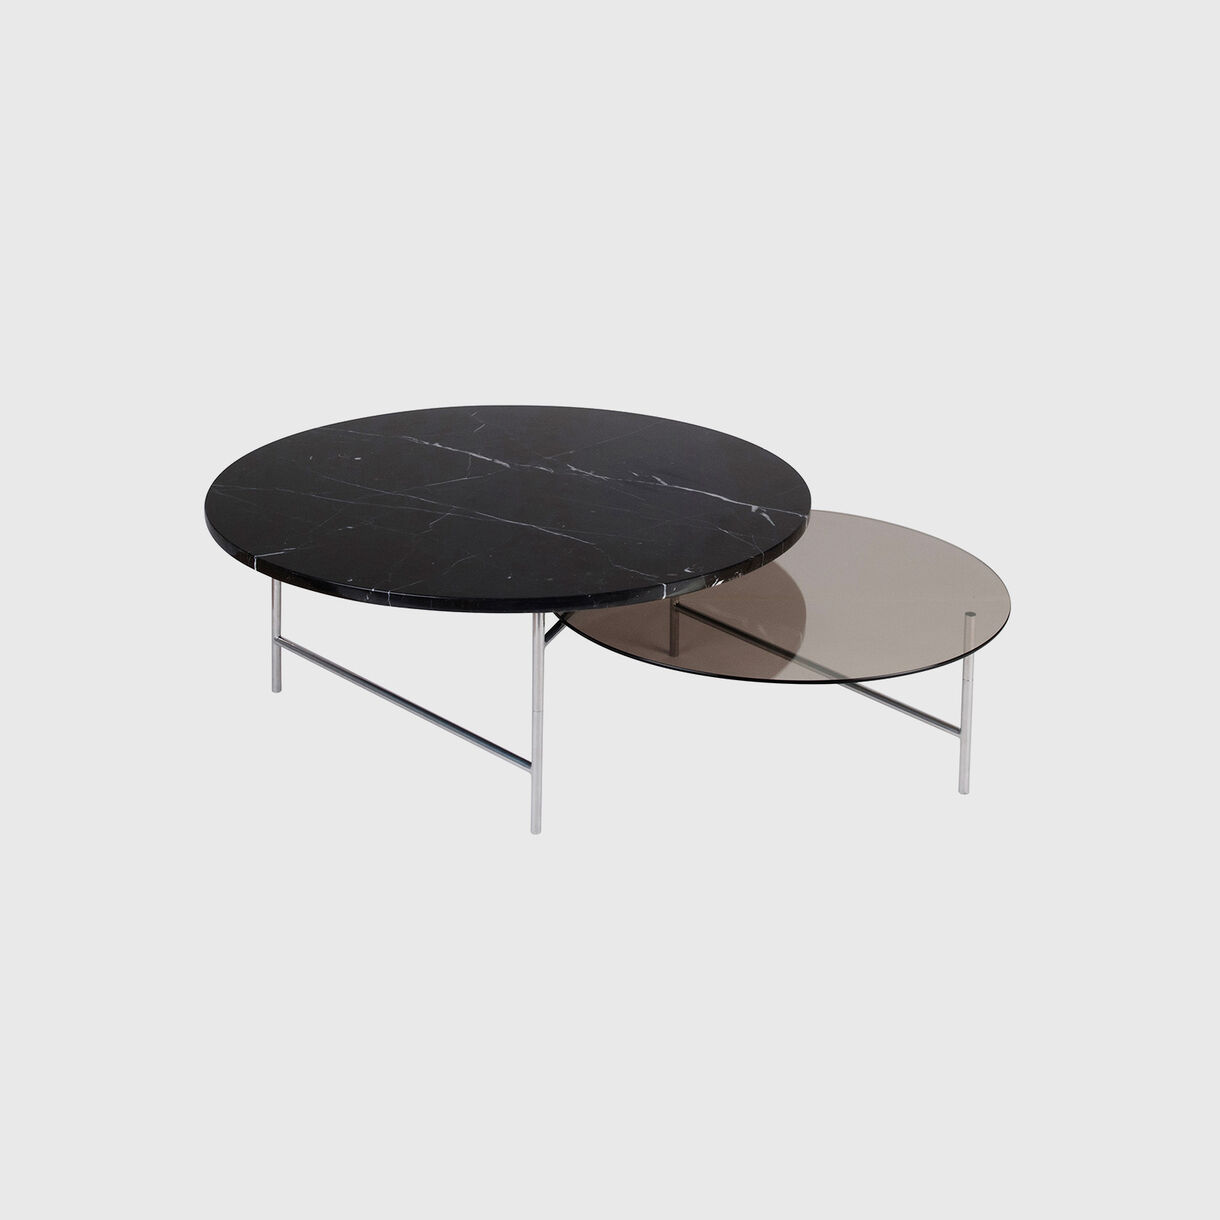 Zorro Coffee Table, Smoke Glass & Black Marble Top